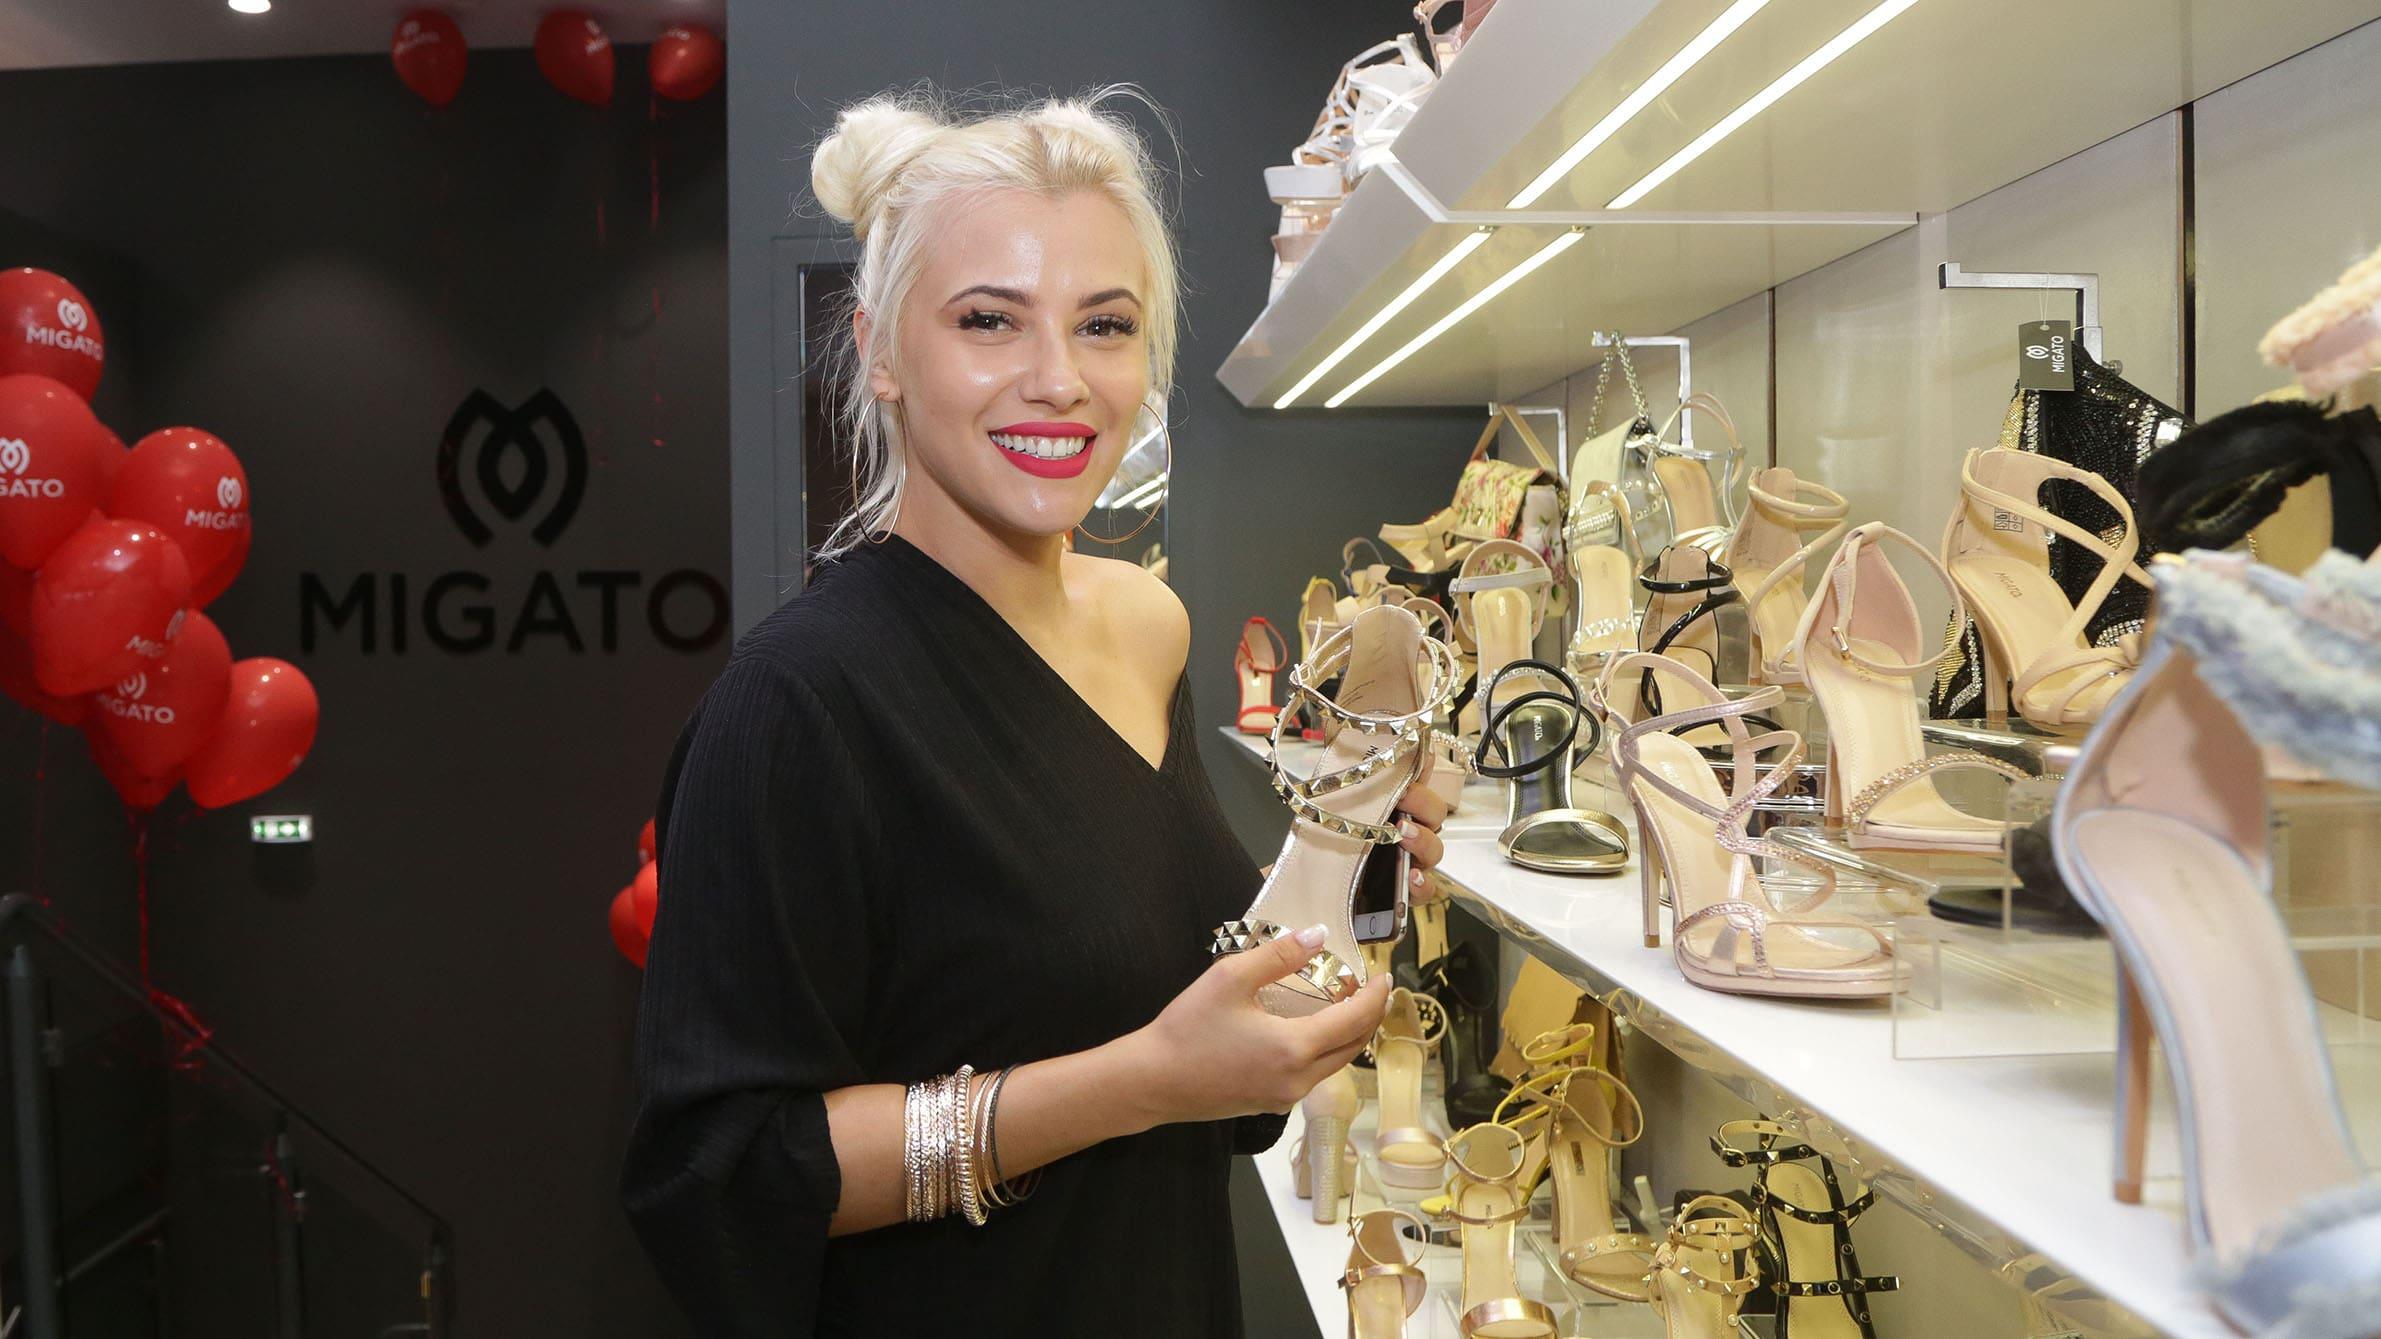 Grand opening of the new MIGATO store in Peristeri